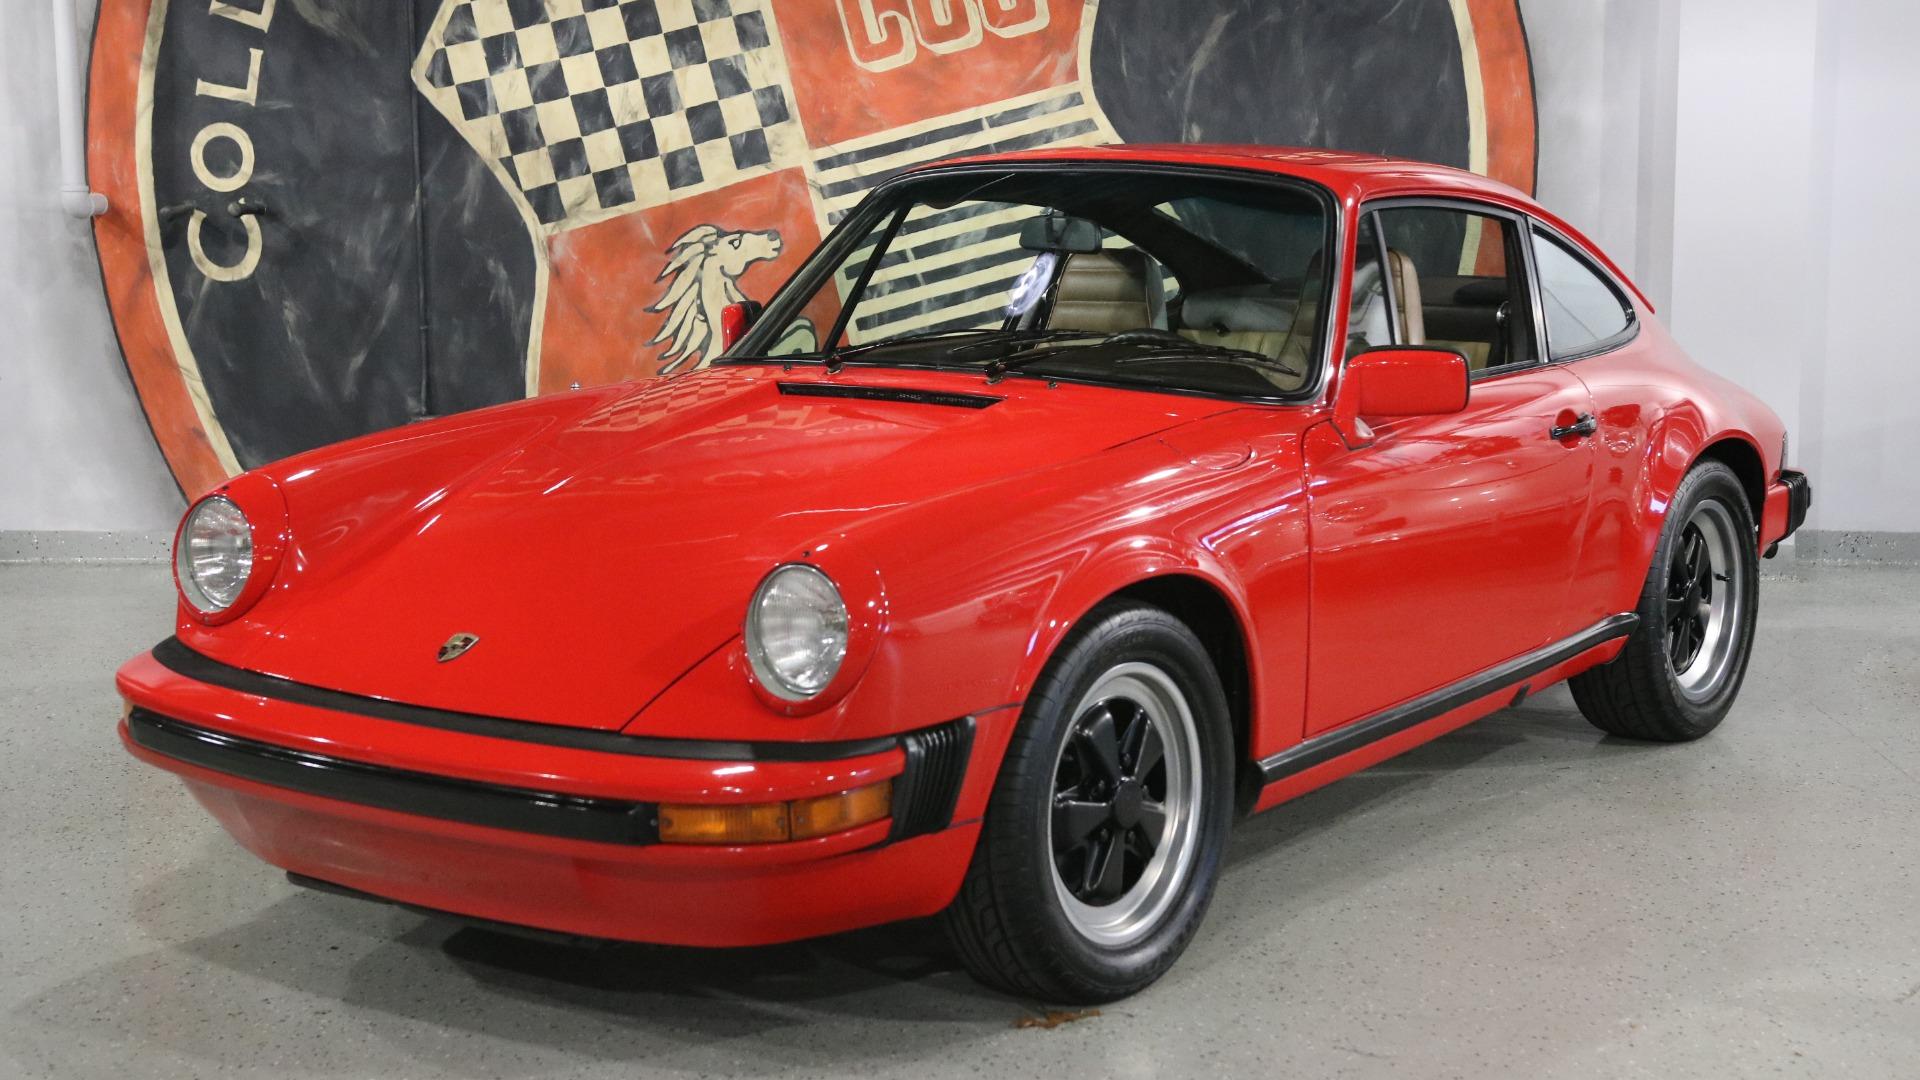 1980 porsche 911 sc stock # 1255x for  near oyster bay, ny